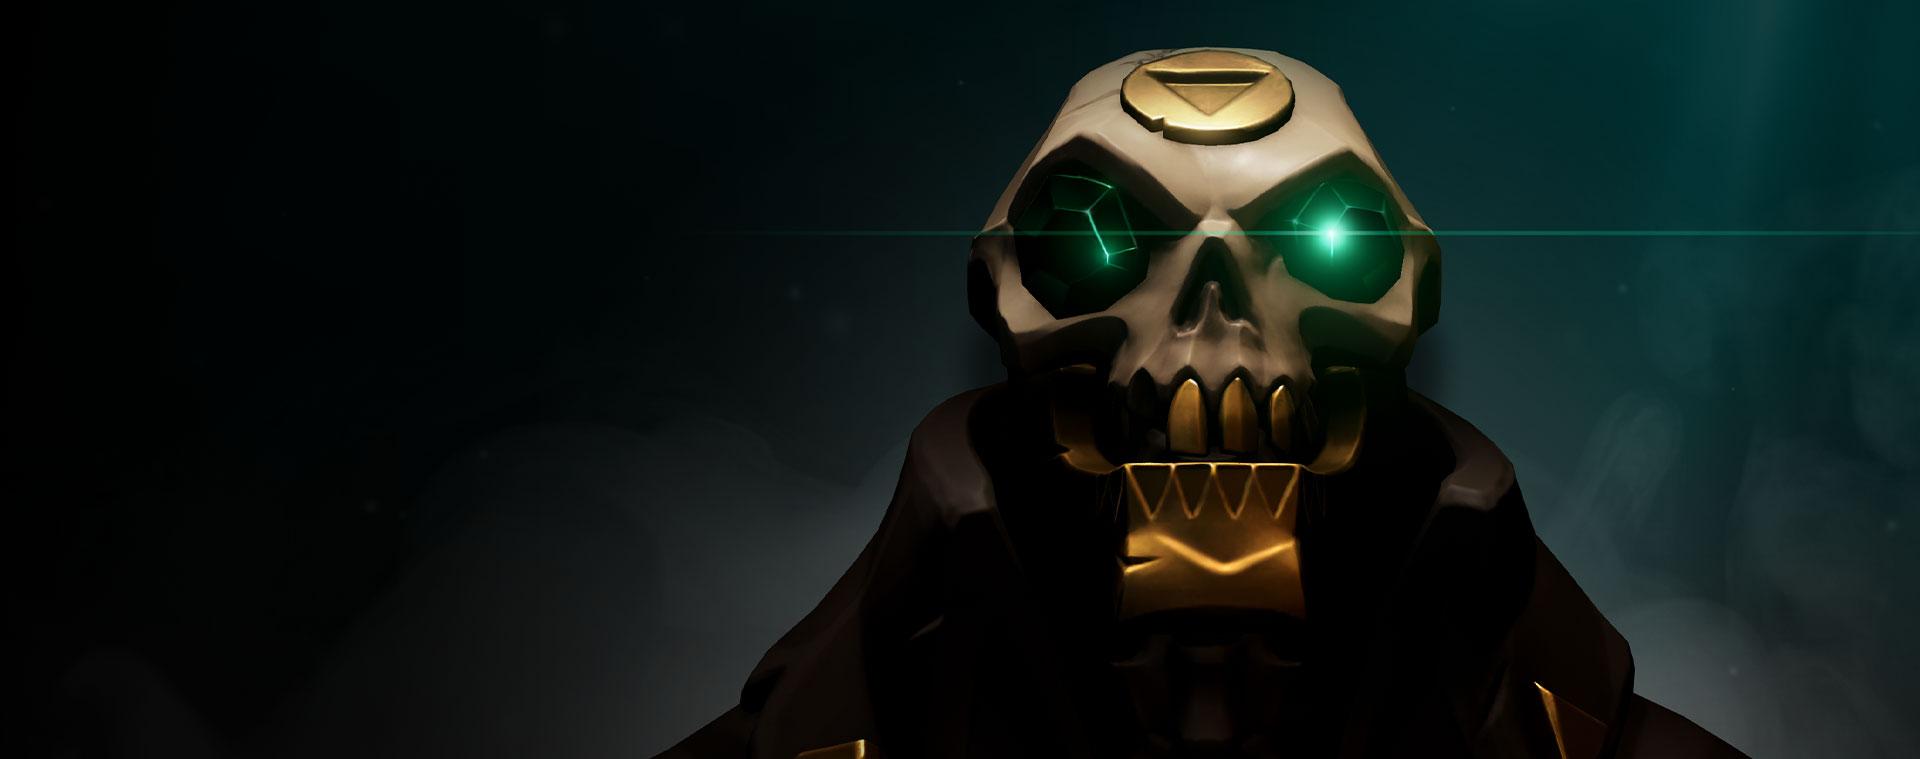 Sea of Thieves 中以綠寶石當做眼睛的骷髏頭